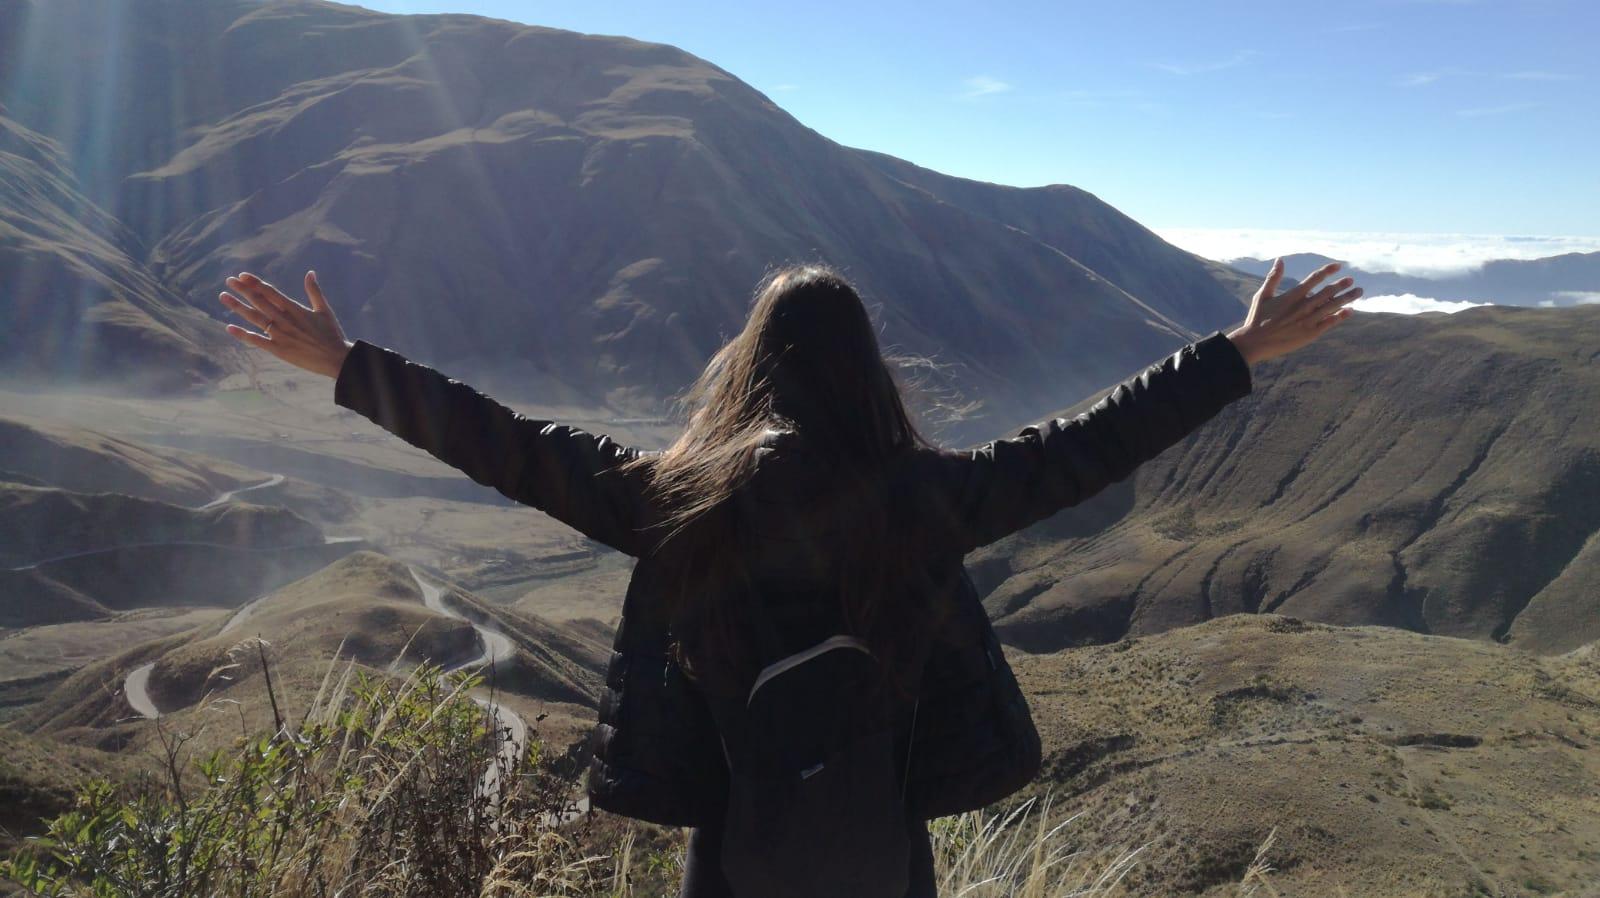 nord ovest argentina itinerario